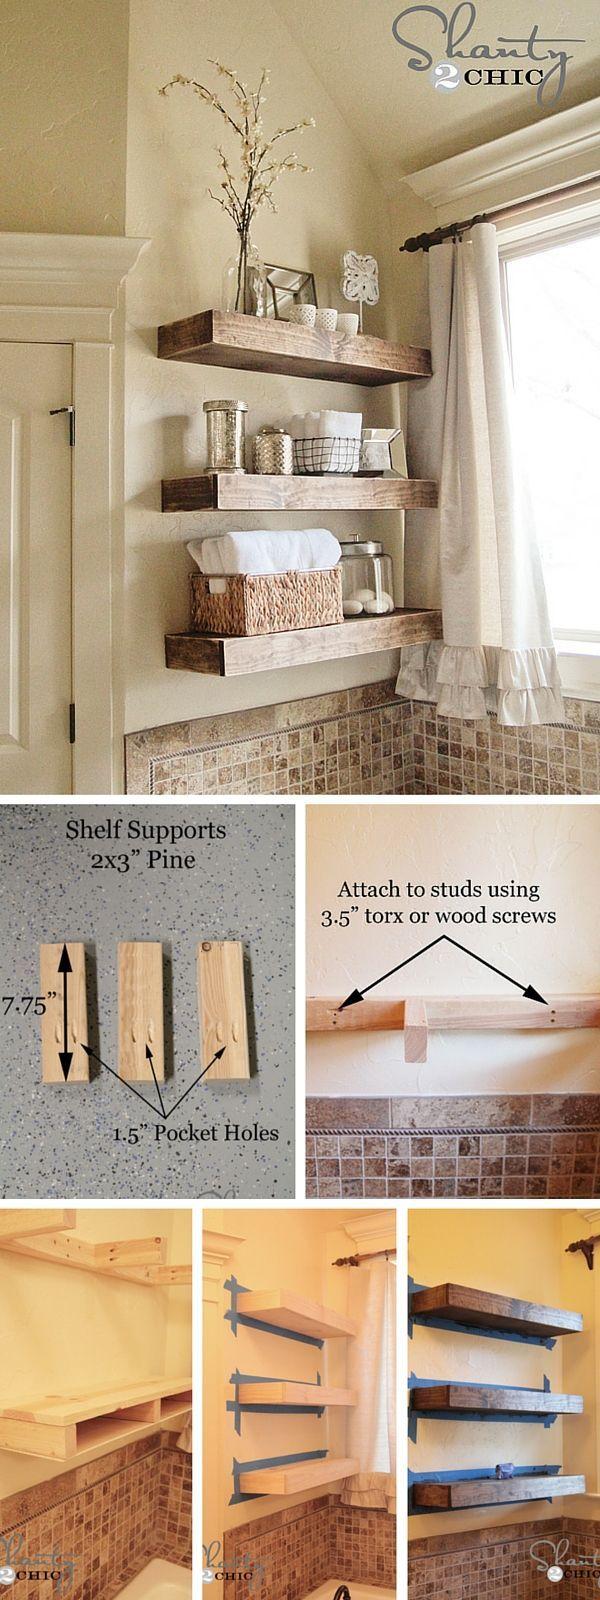 diy bathroom upgrades to impress rustic bathrooms shelves and